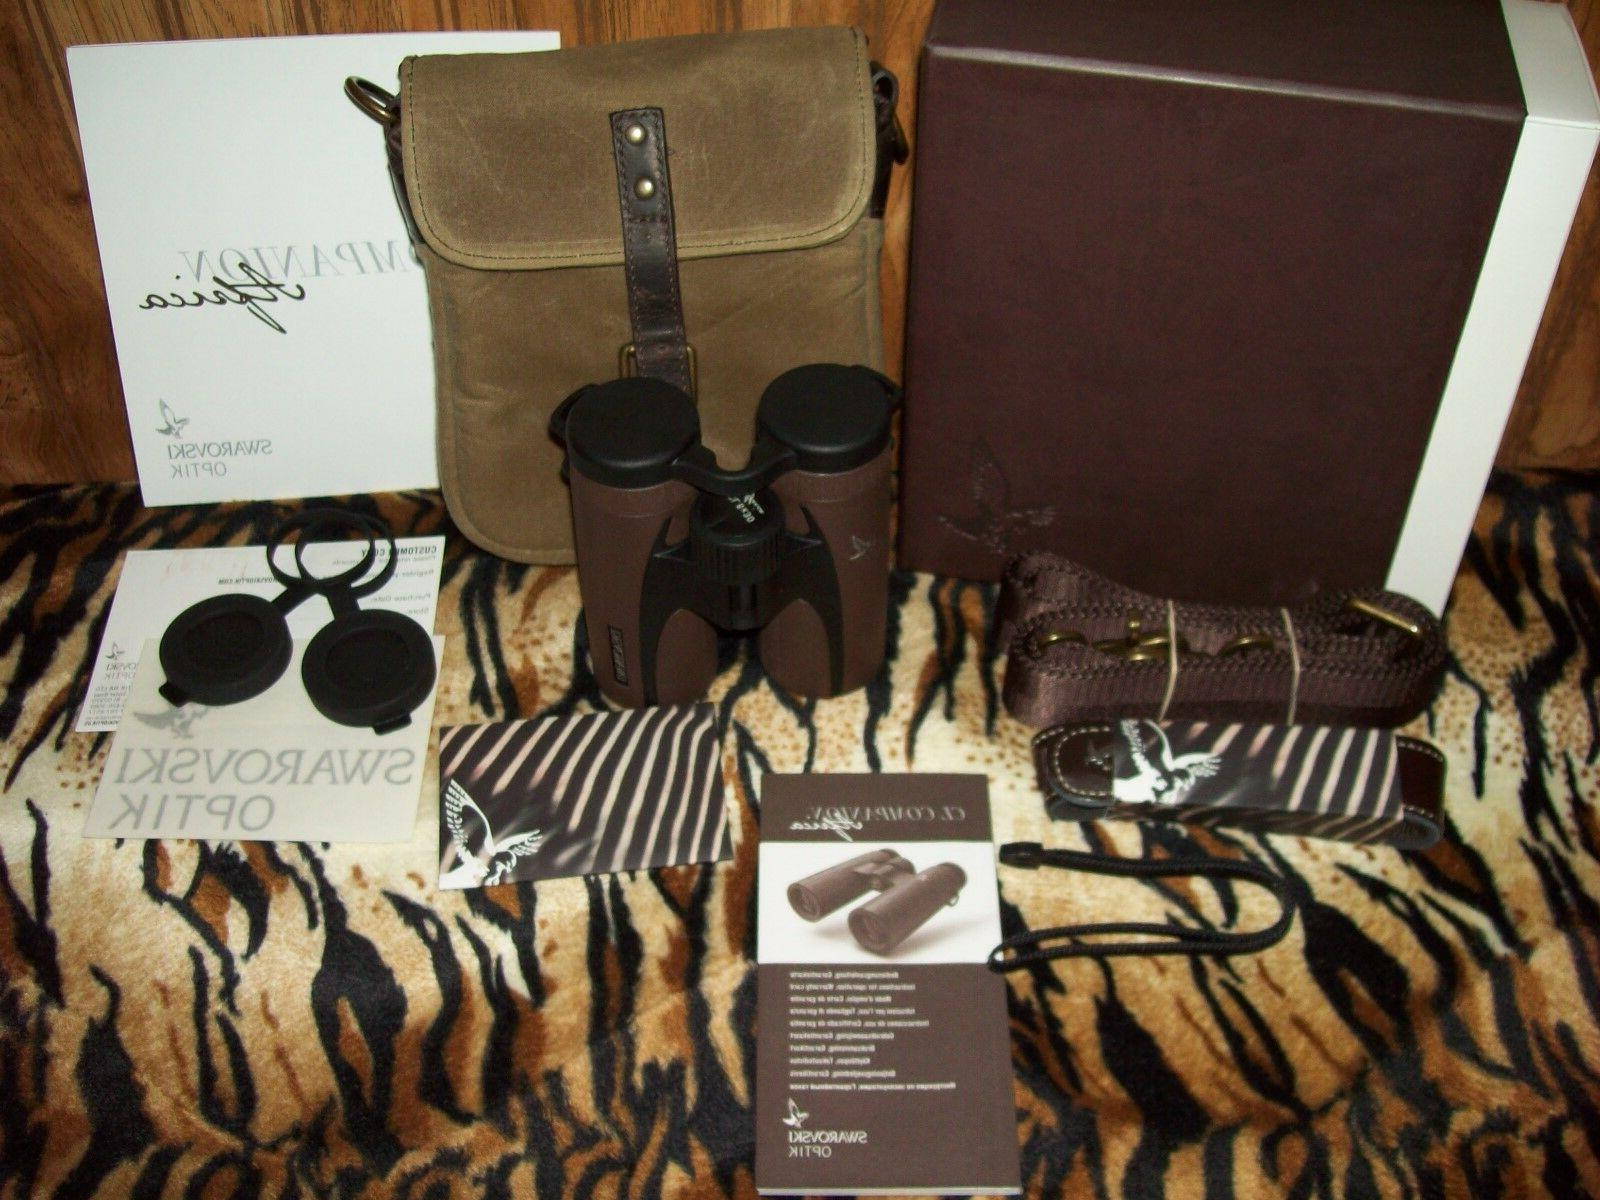 Swarovski Optik~CL 8x30 Companion Binoculars~Africa Limited